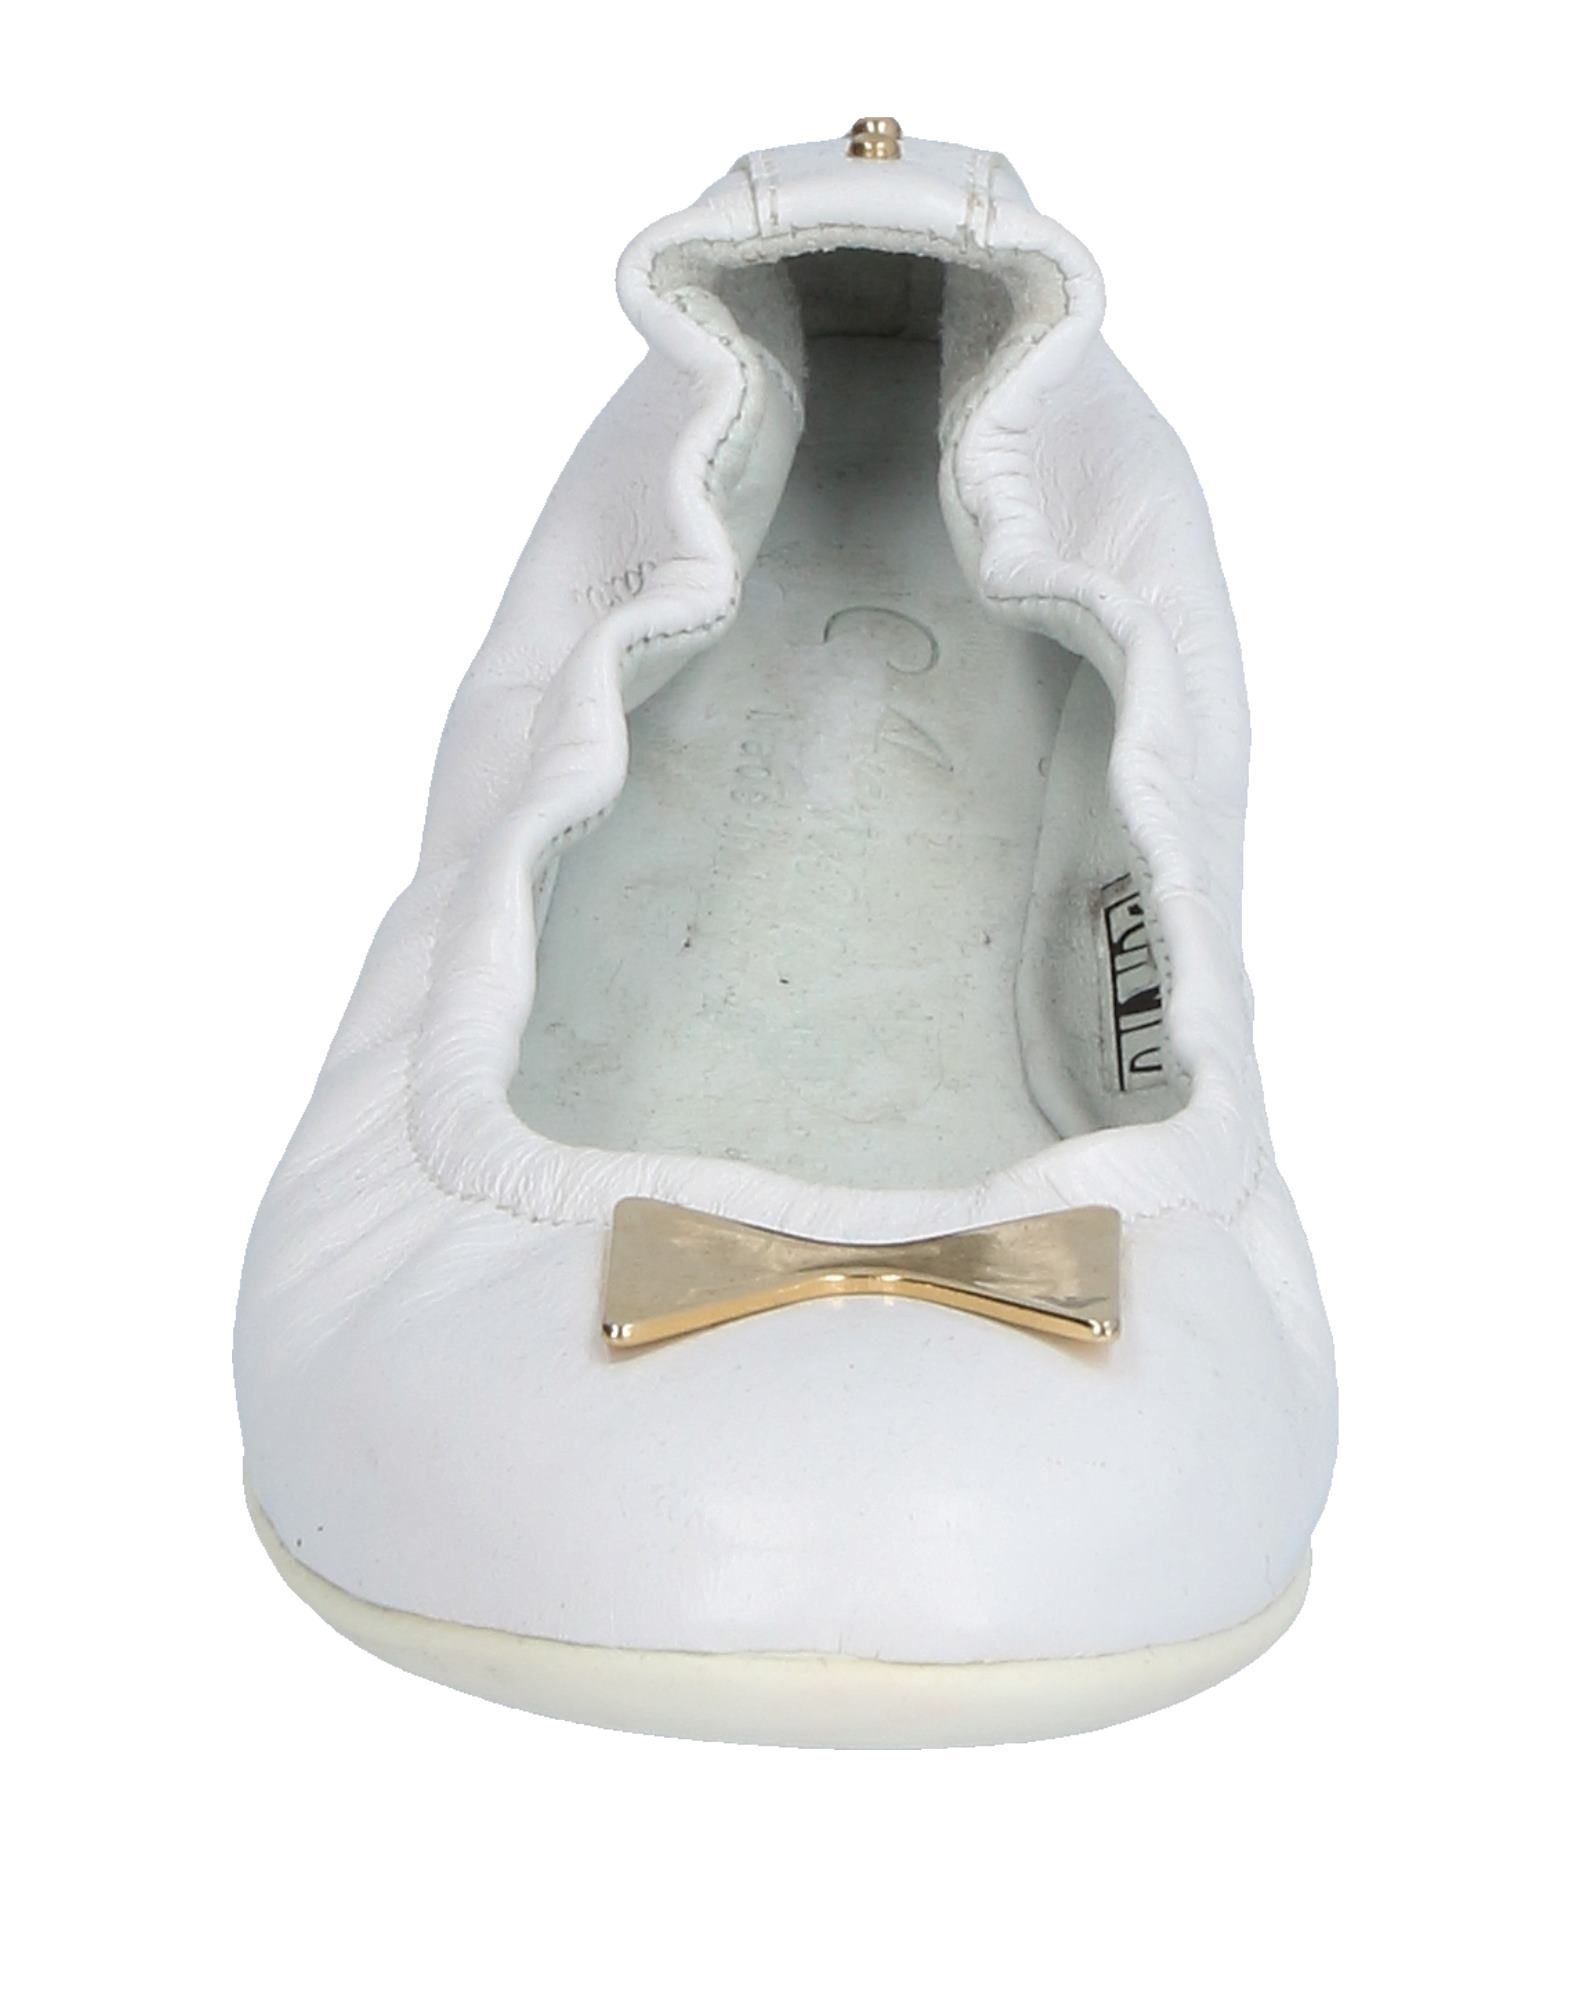 FOOTWEAR Armani Junior White Girl Leather